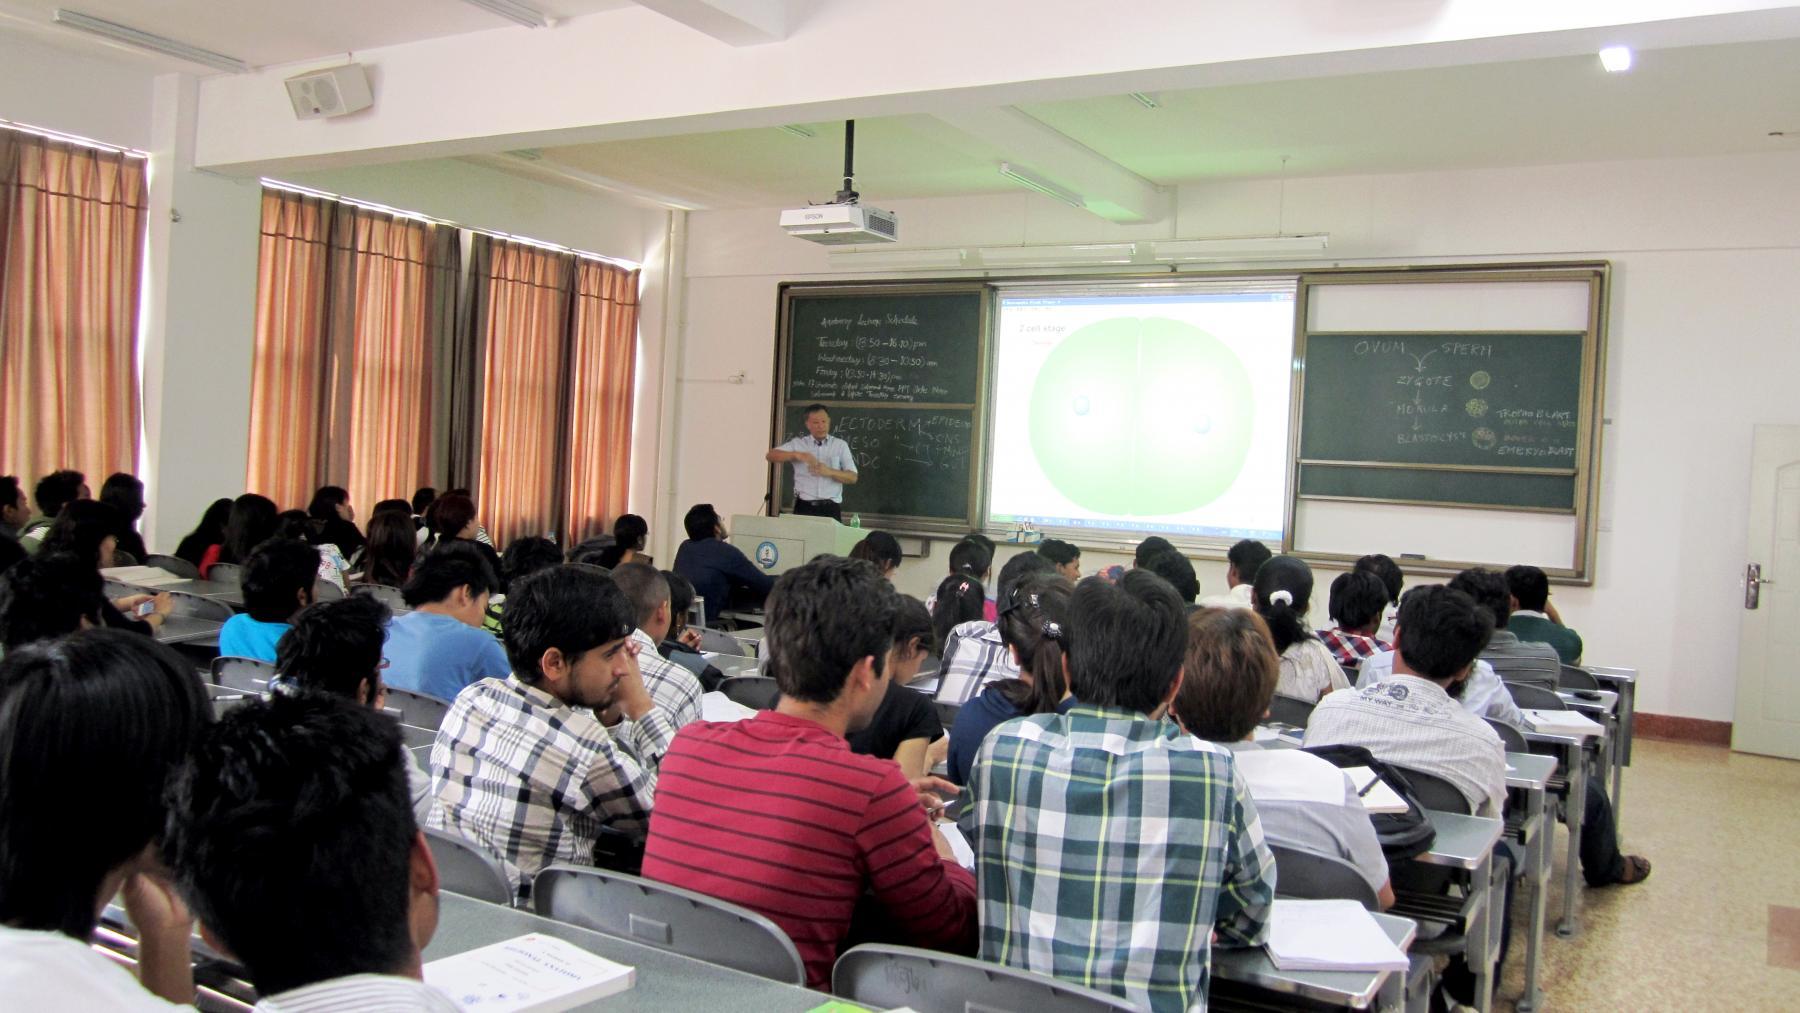 KMU classroom in progress